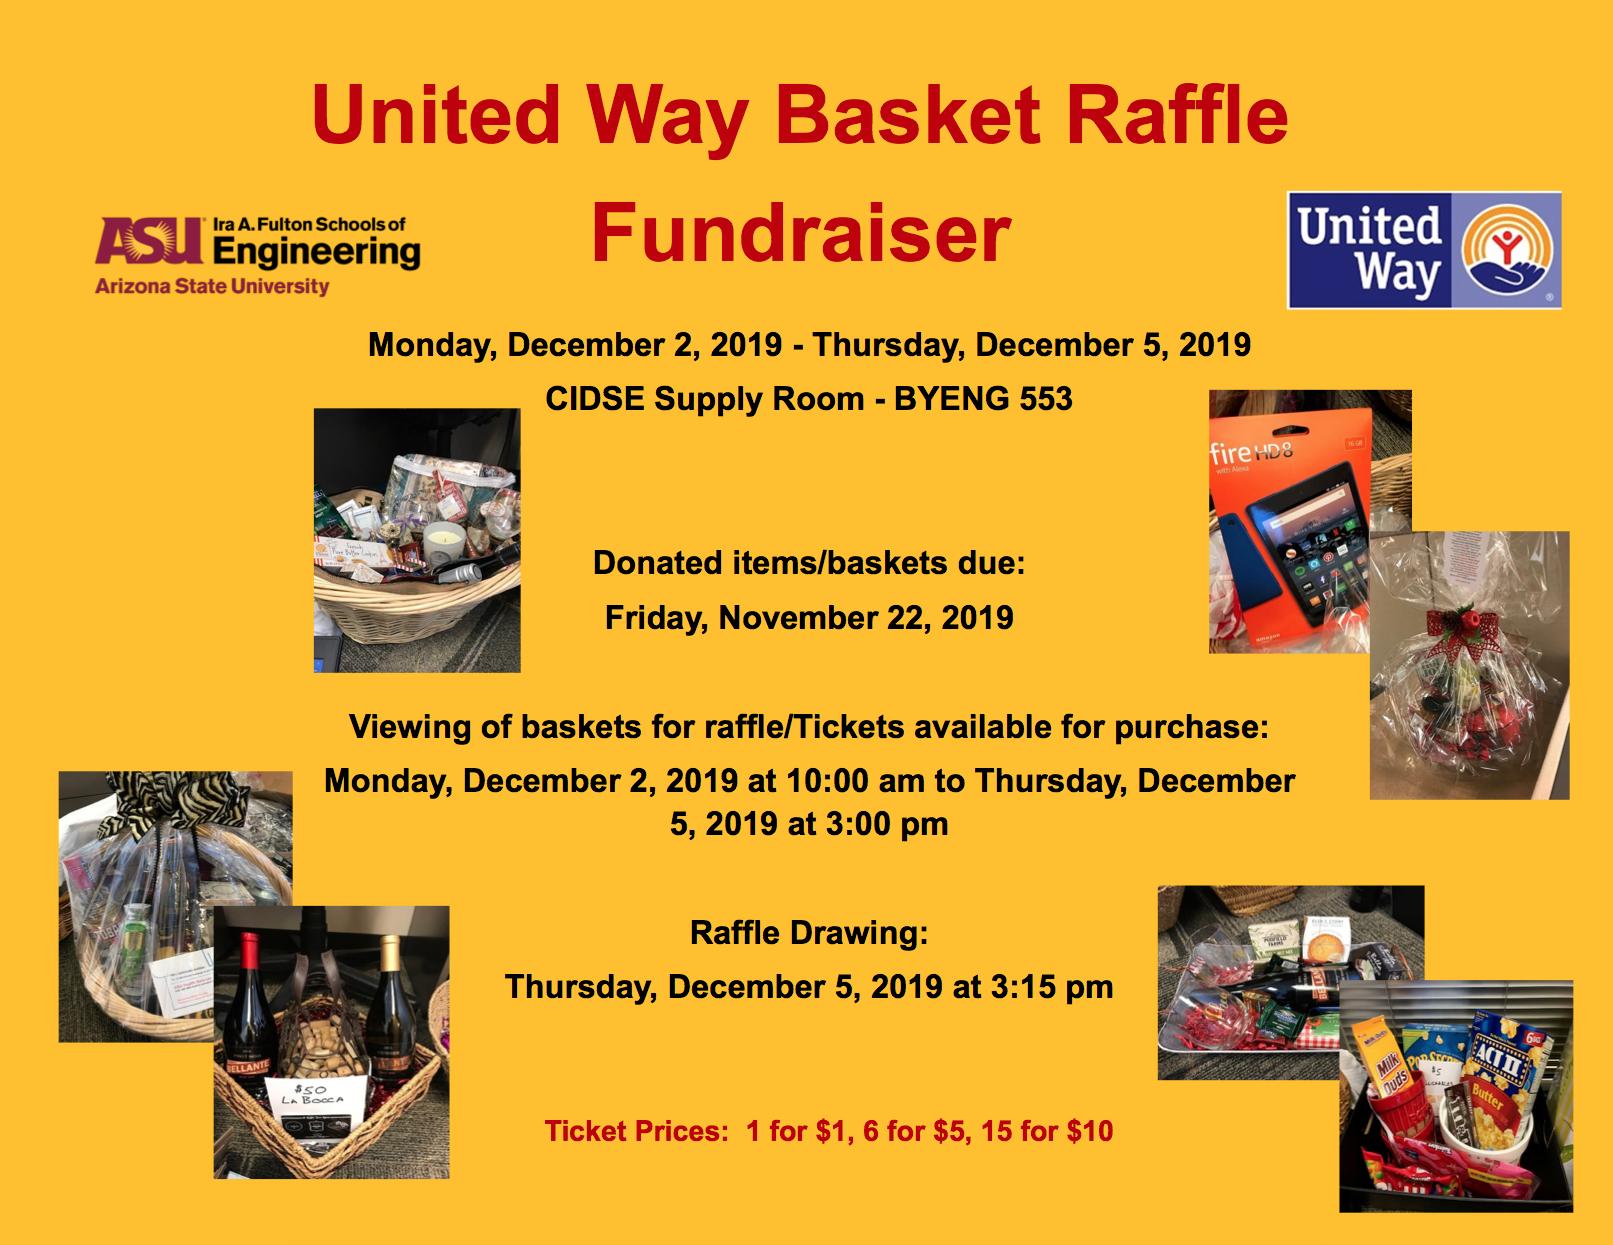 United Way Basket Raffle Fundraiser flyer